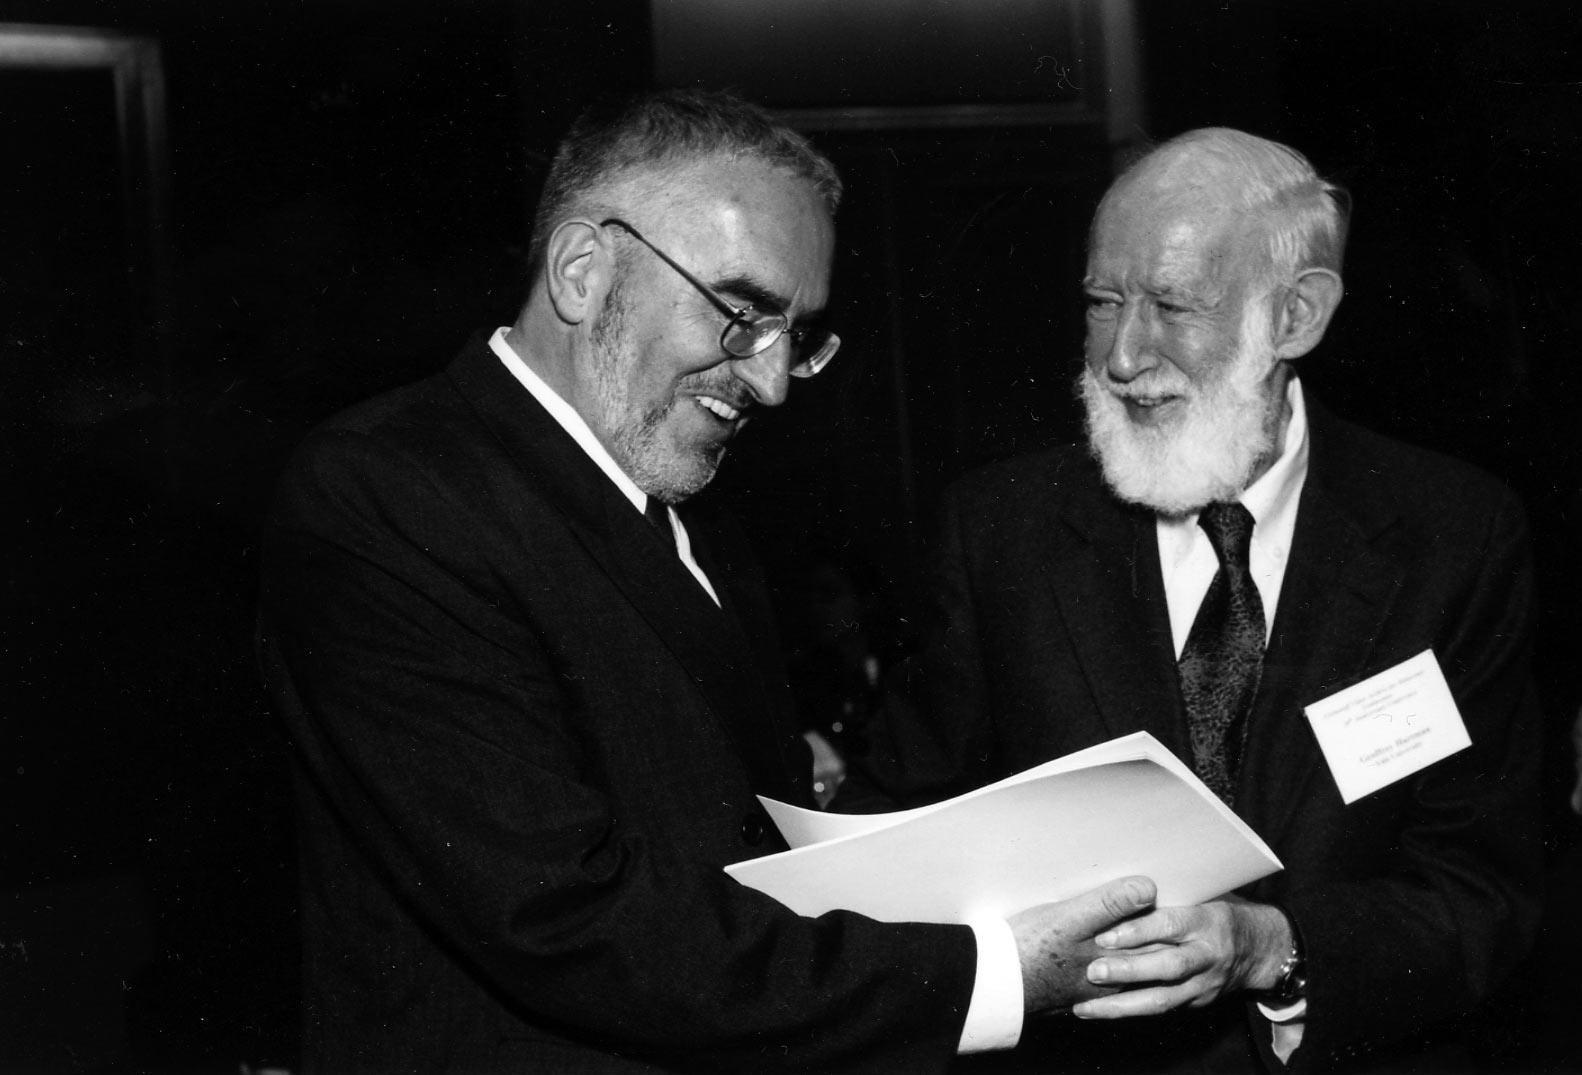 Professor Geoffrey Hartman and sociologist Martin Butora